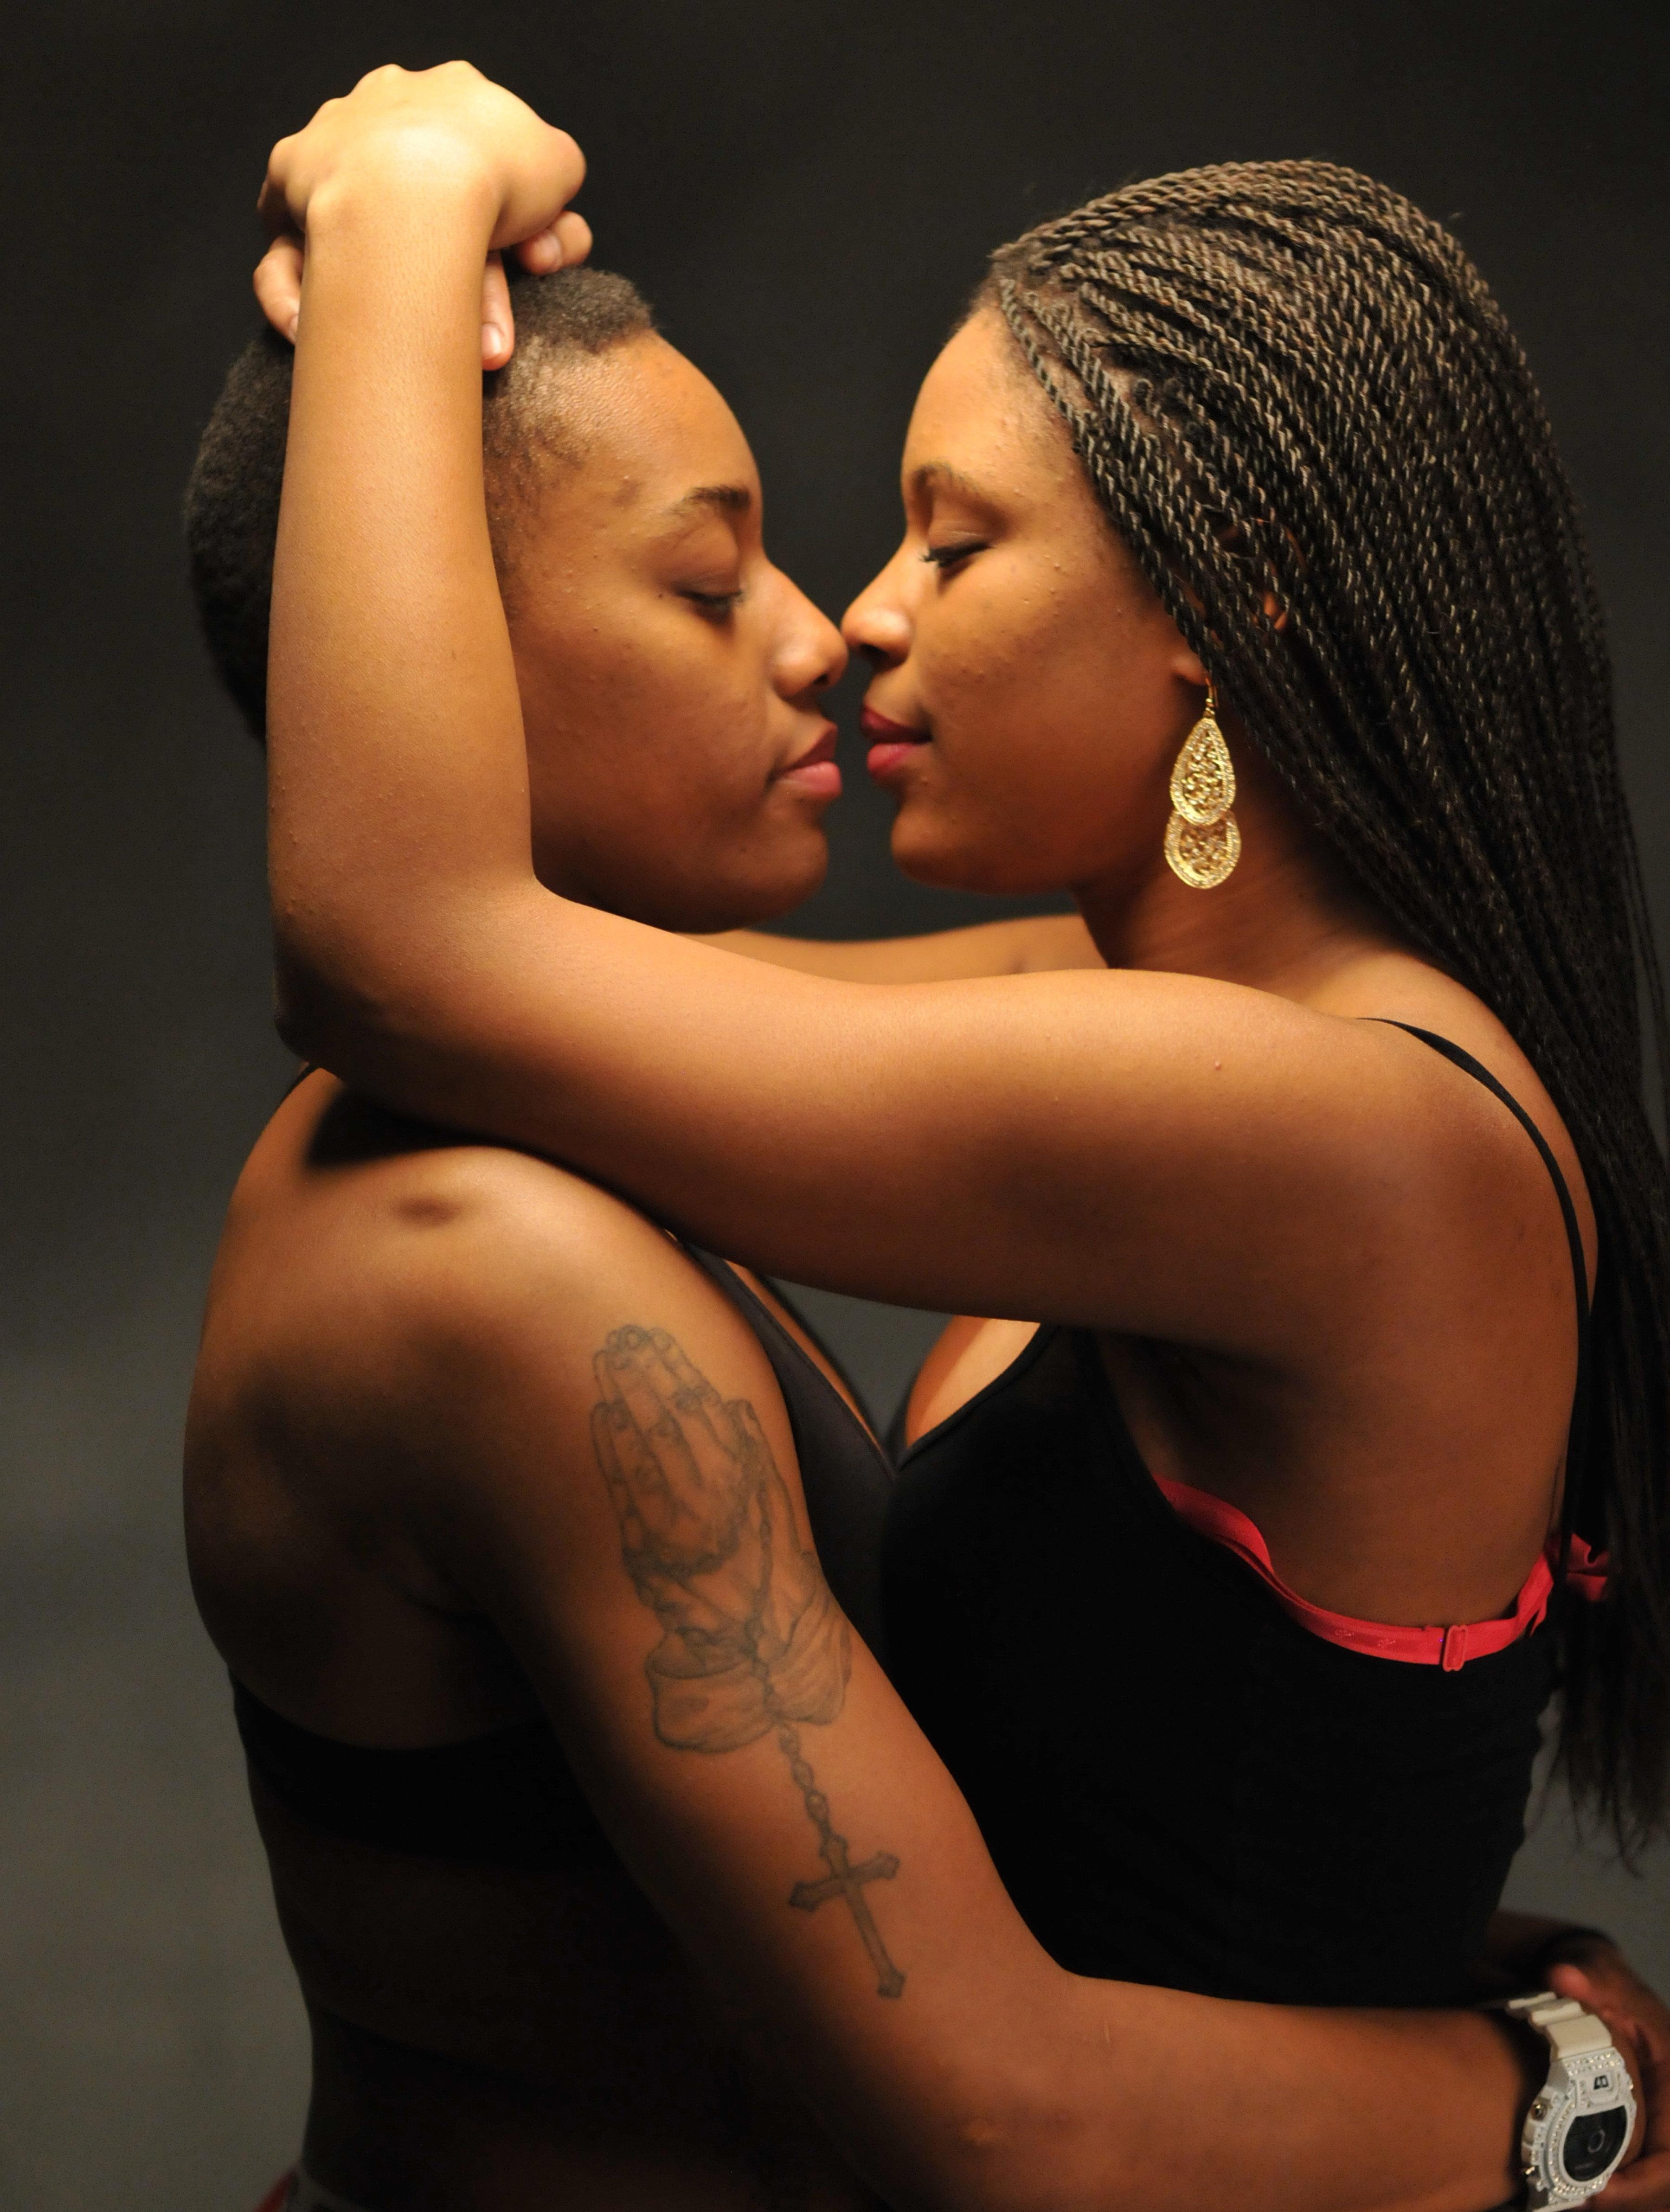 Lesbian intimate secret sex bed